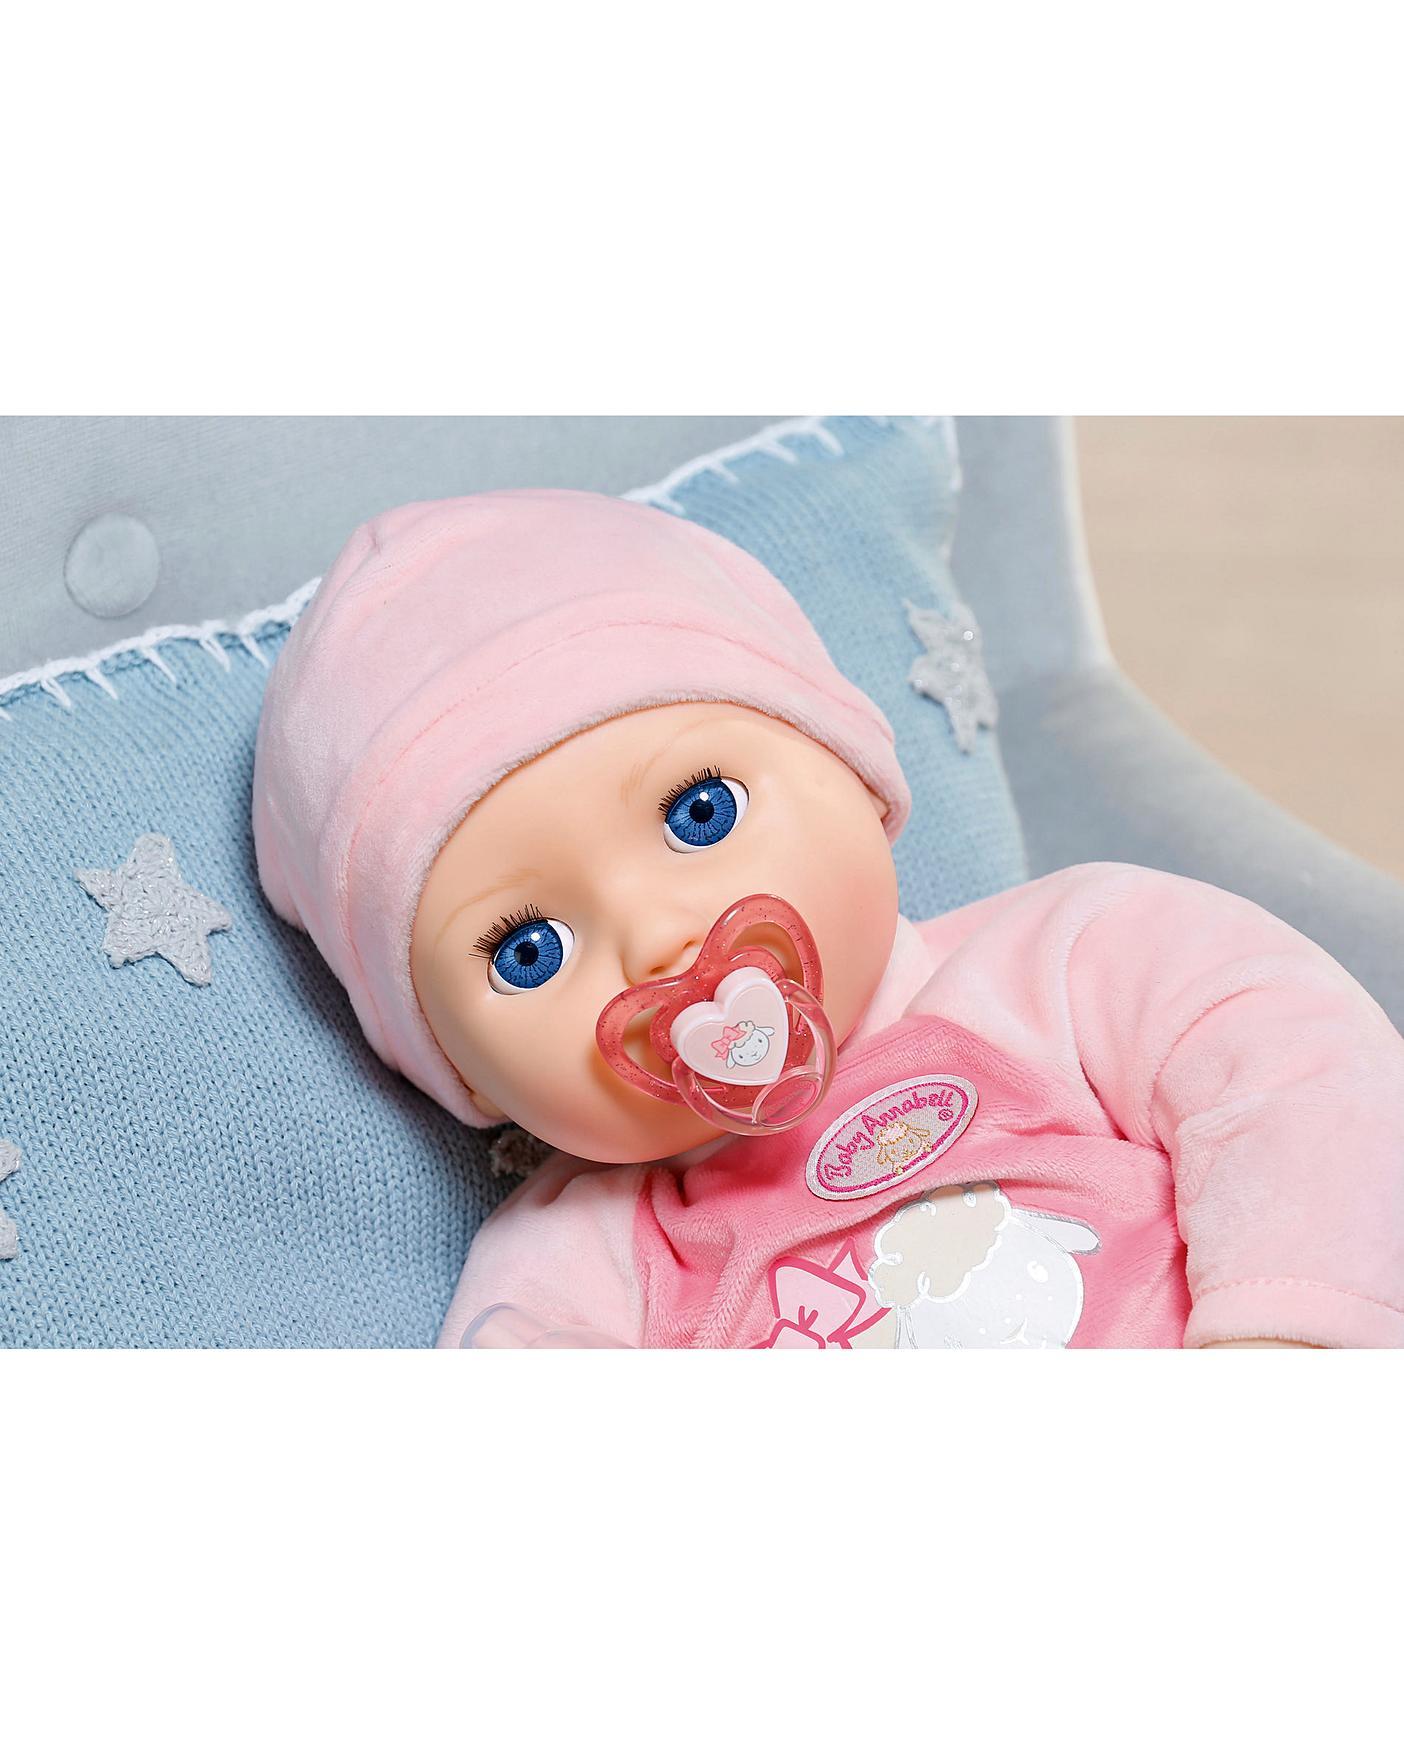 Baby Annabell 43cm   J D Williams